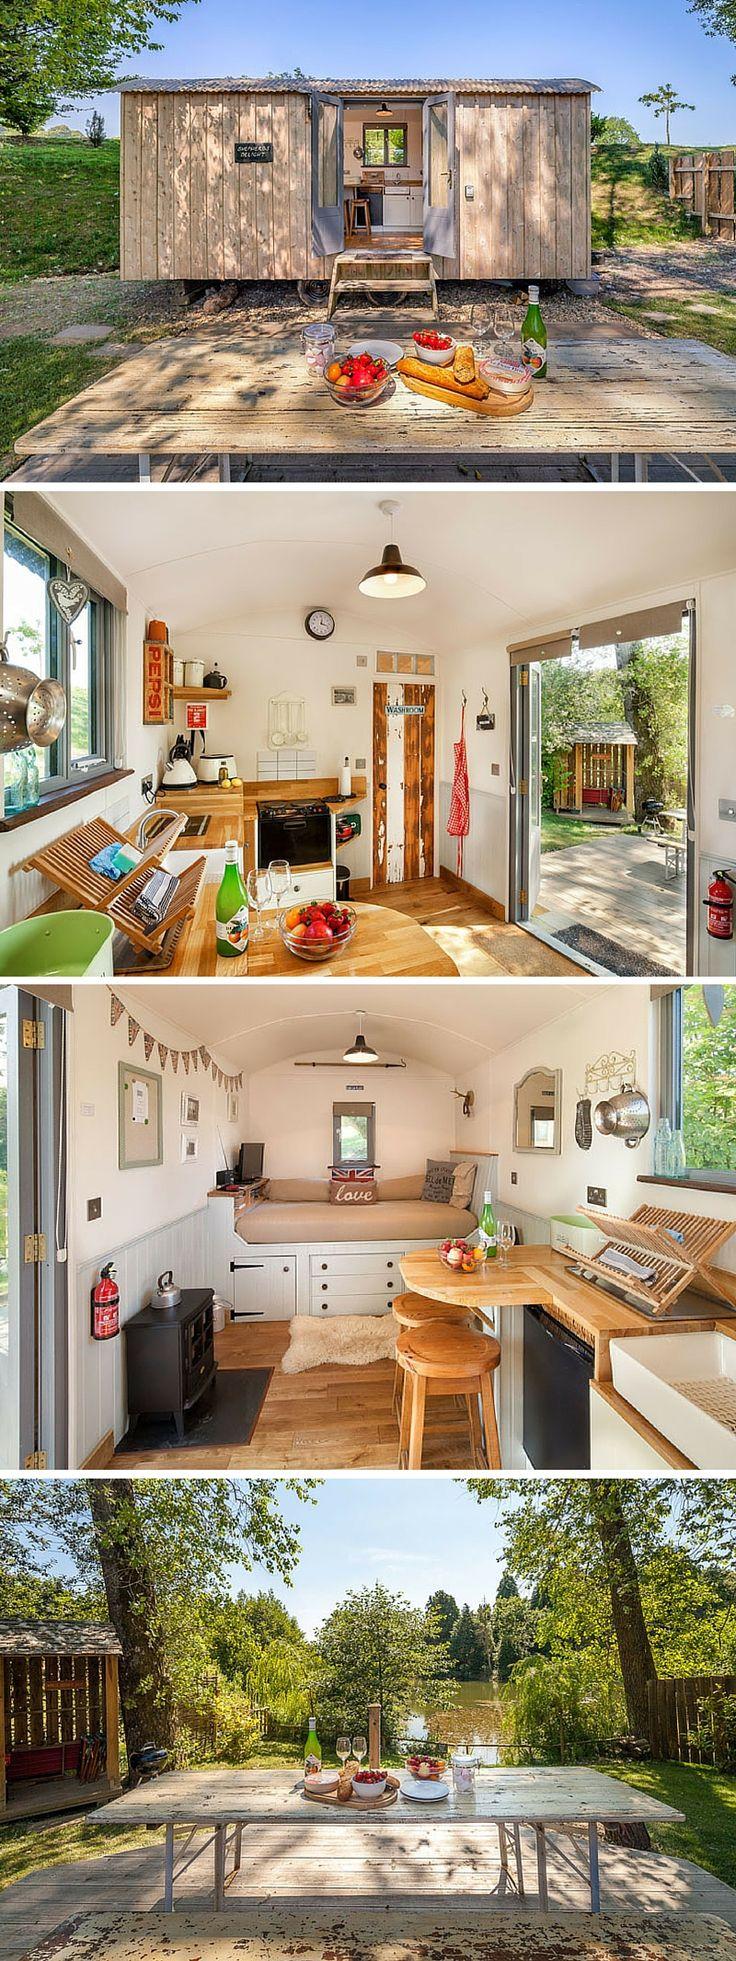 best Мини дом images on pinterest apartments bedroom ideas